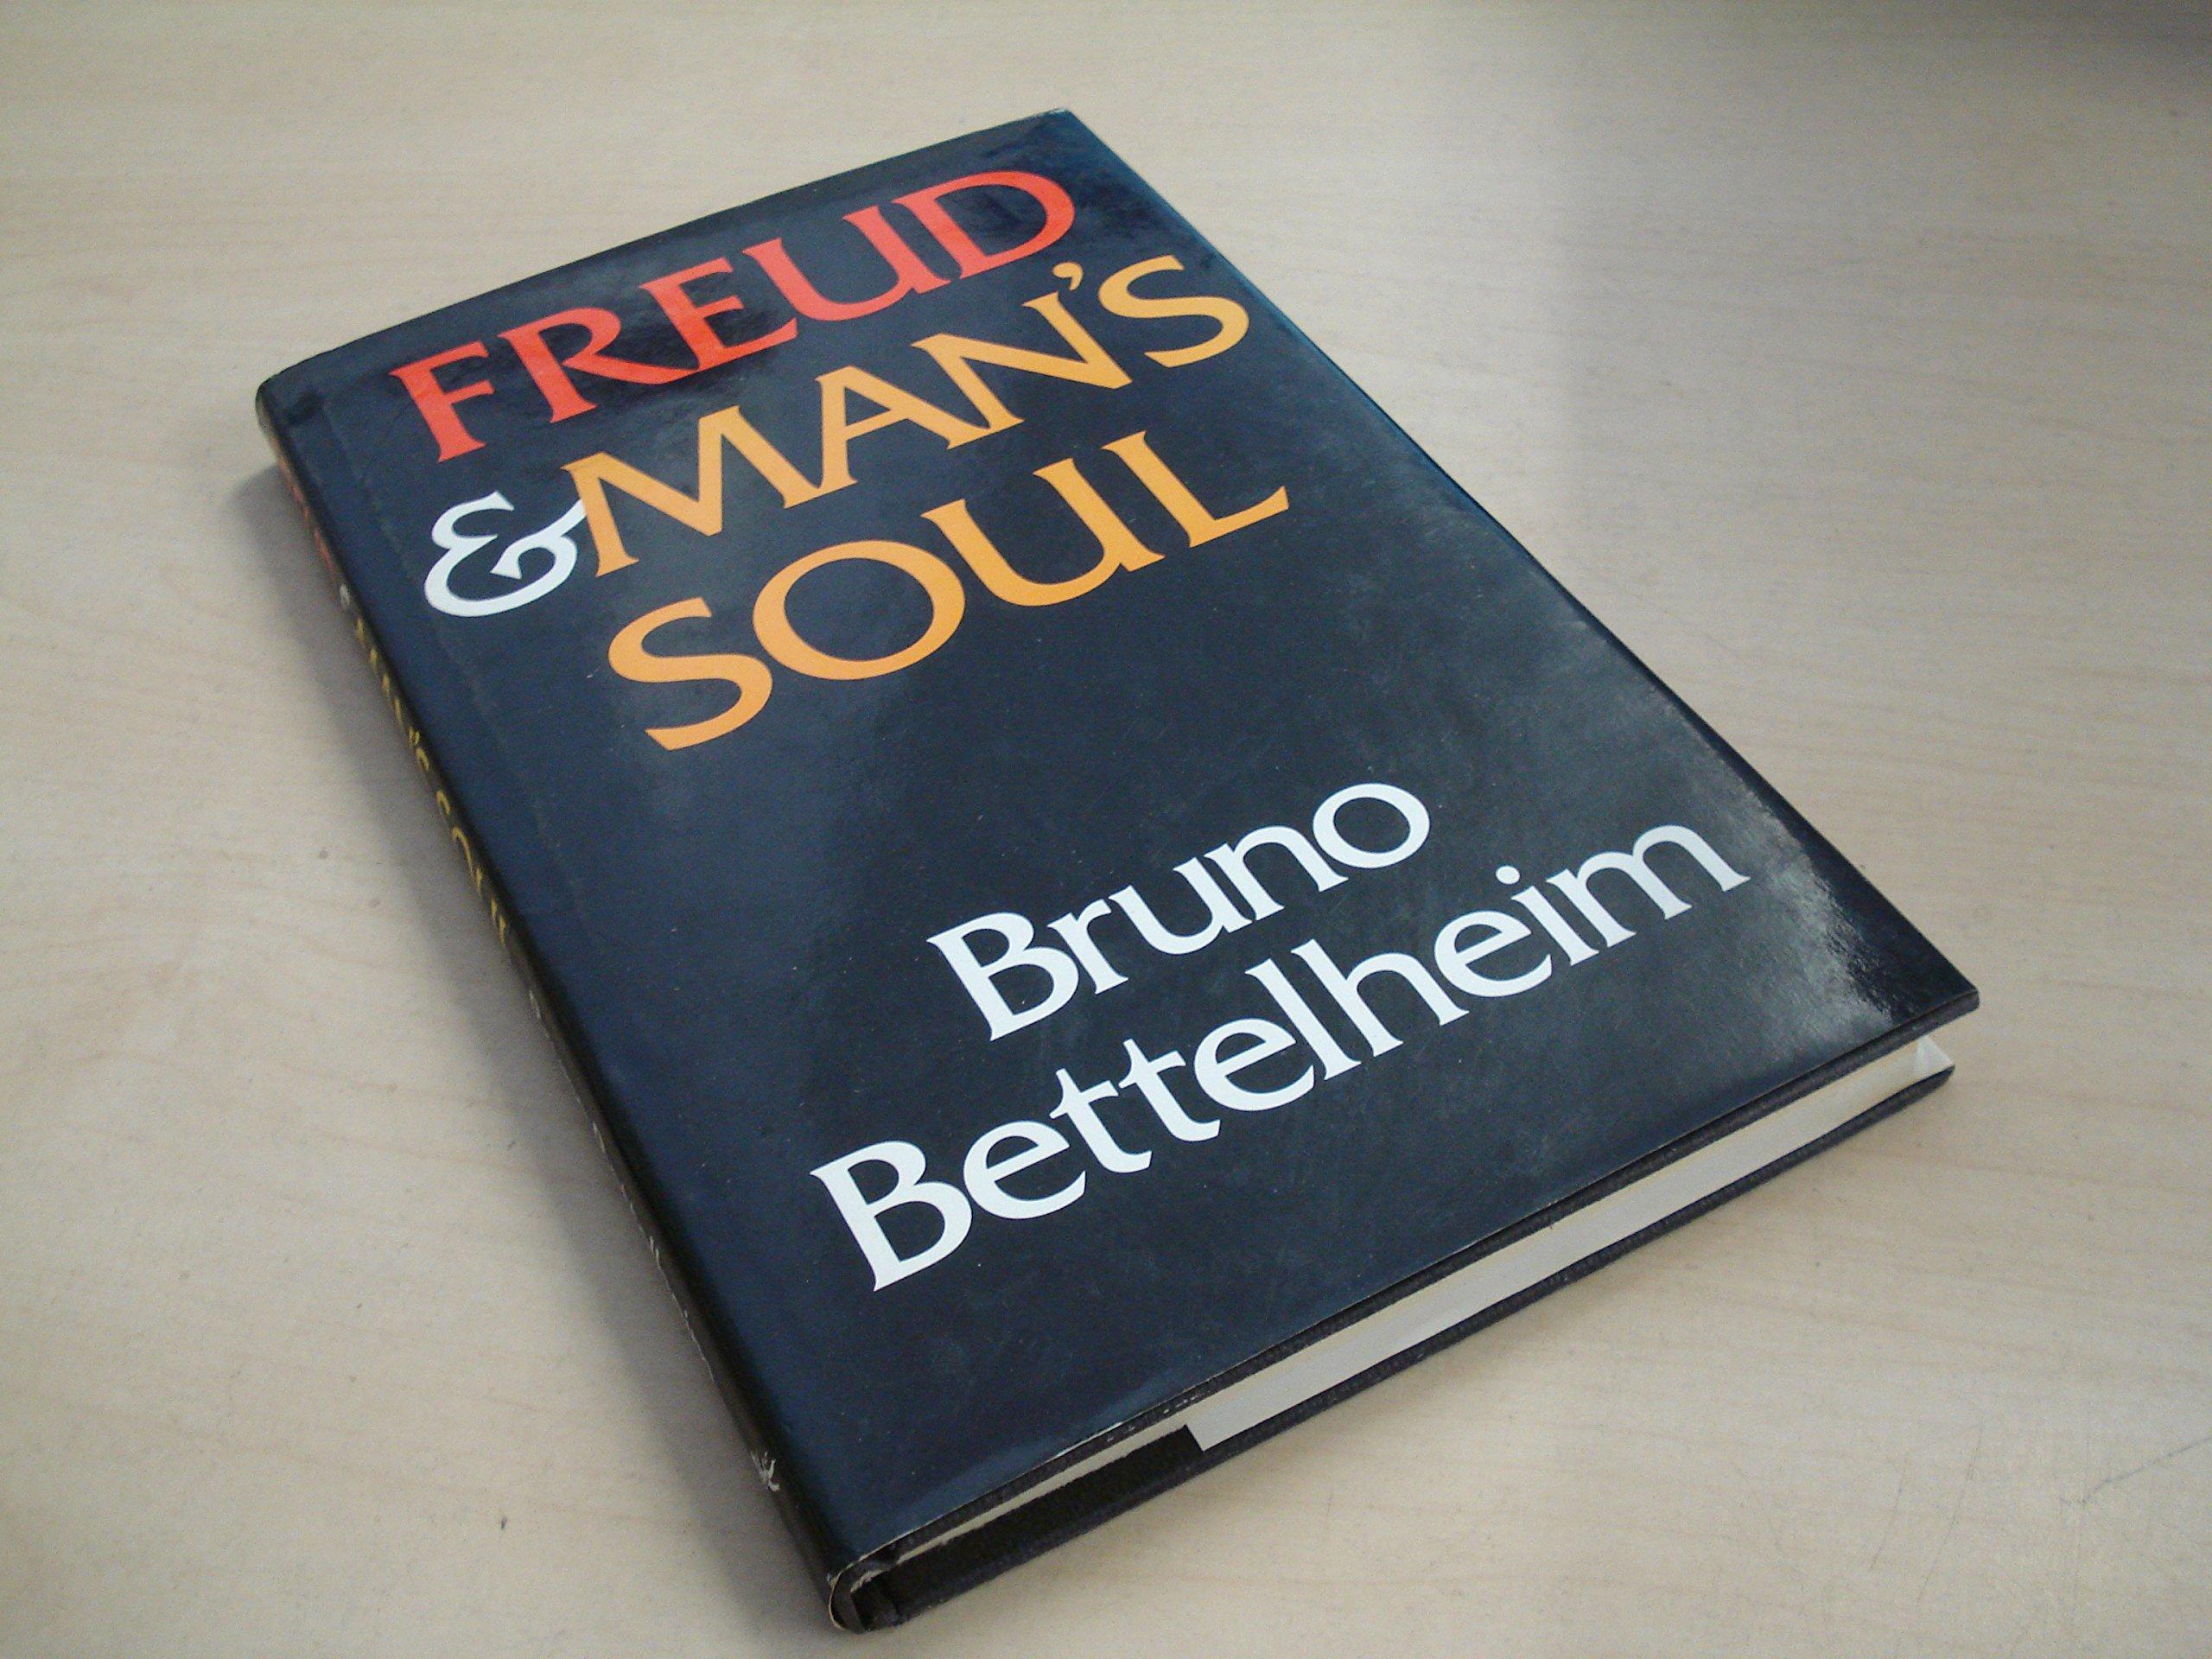 Freud and Man's Soul: Amazon.co.uk: Bruno Bettelheim: 9780701127046: Books